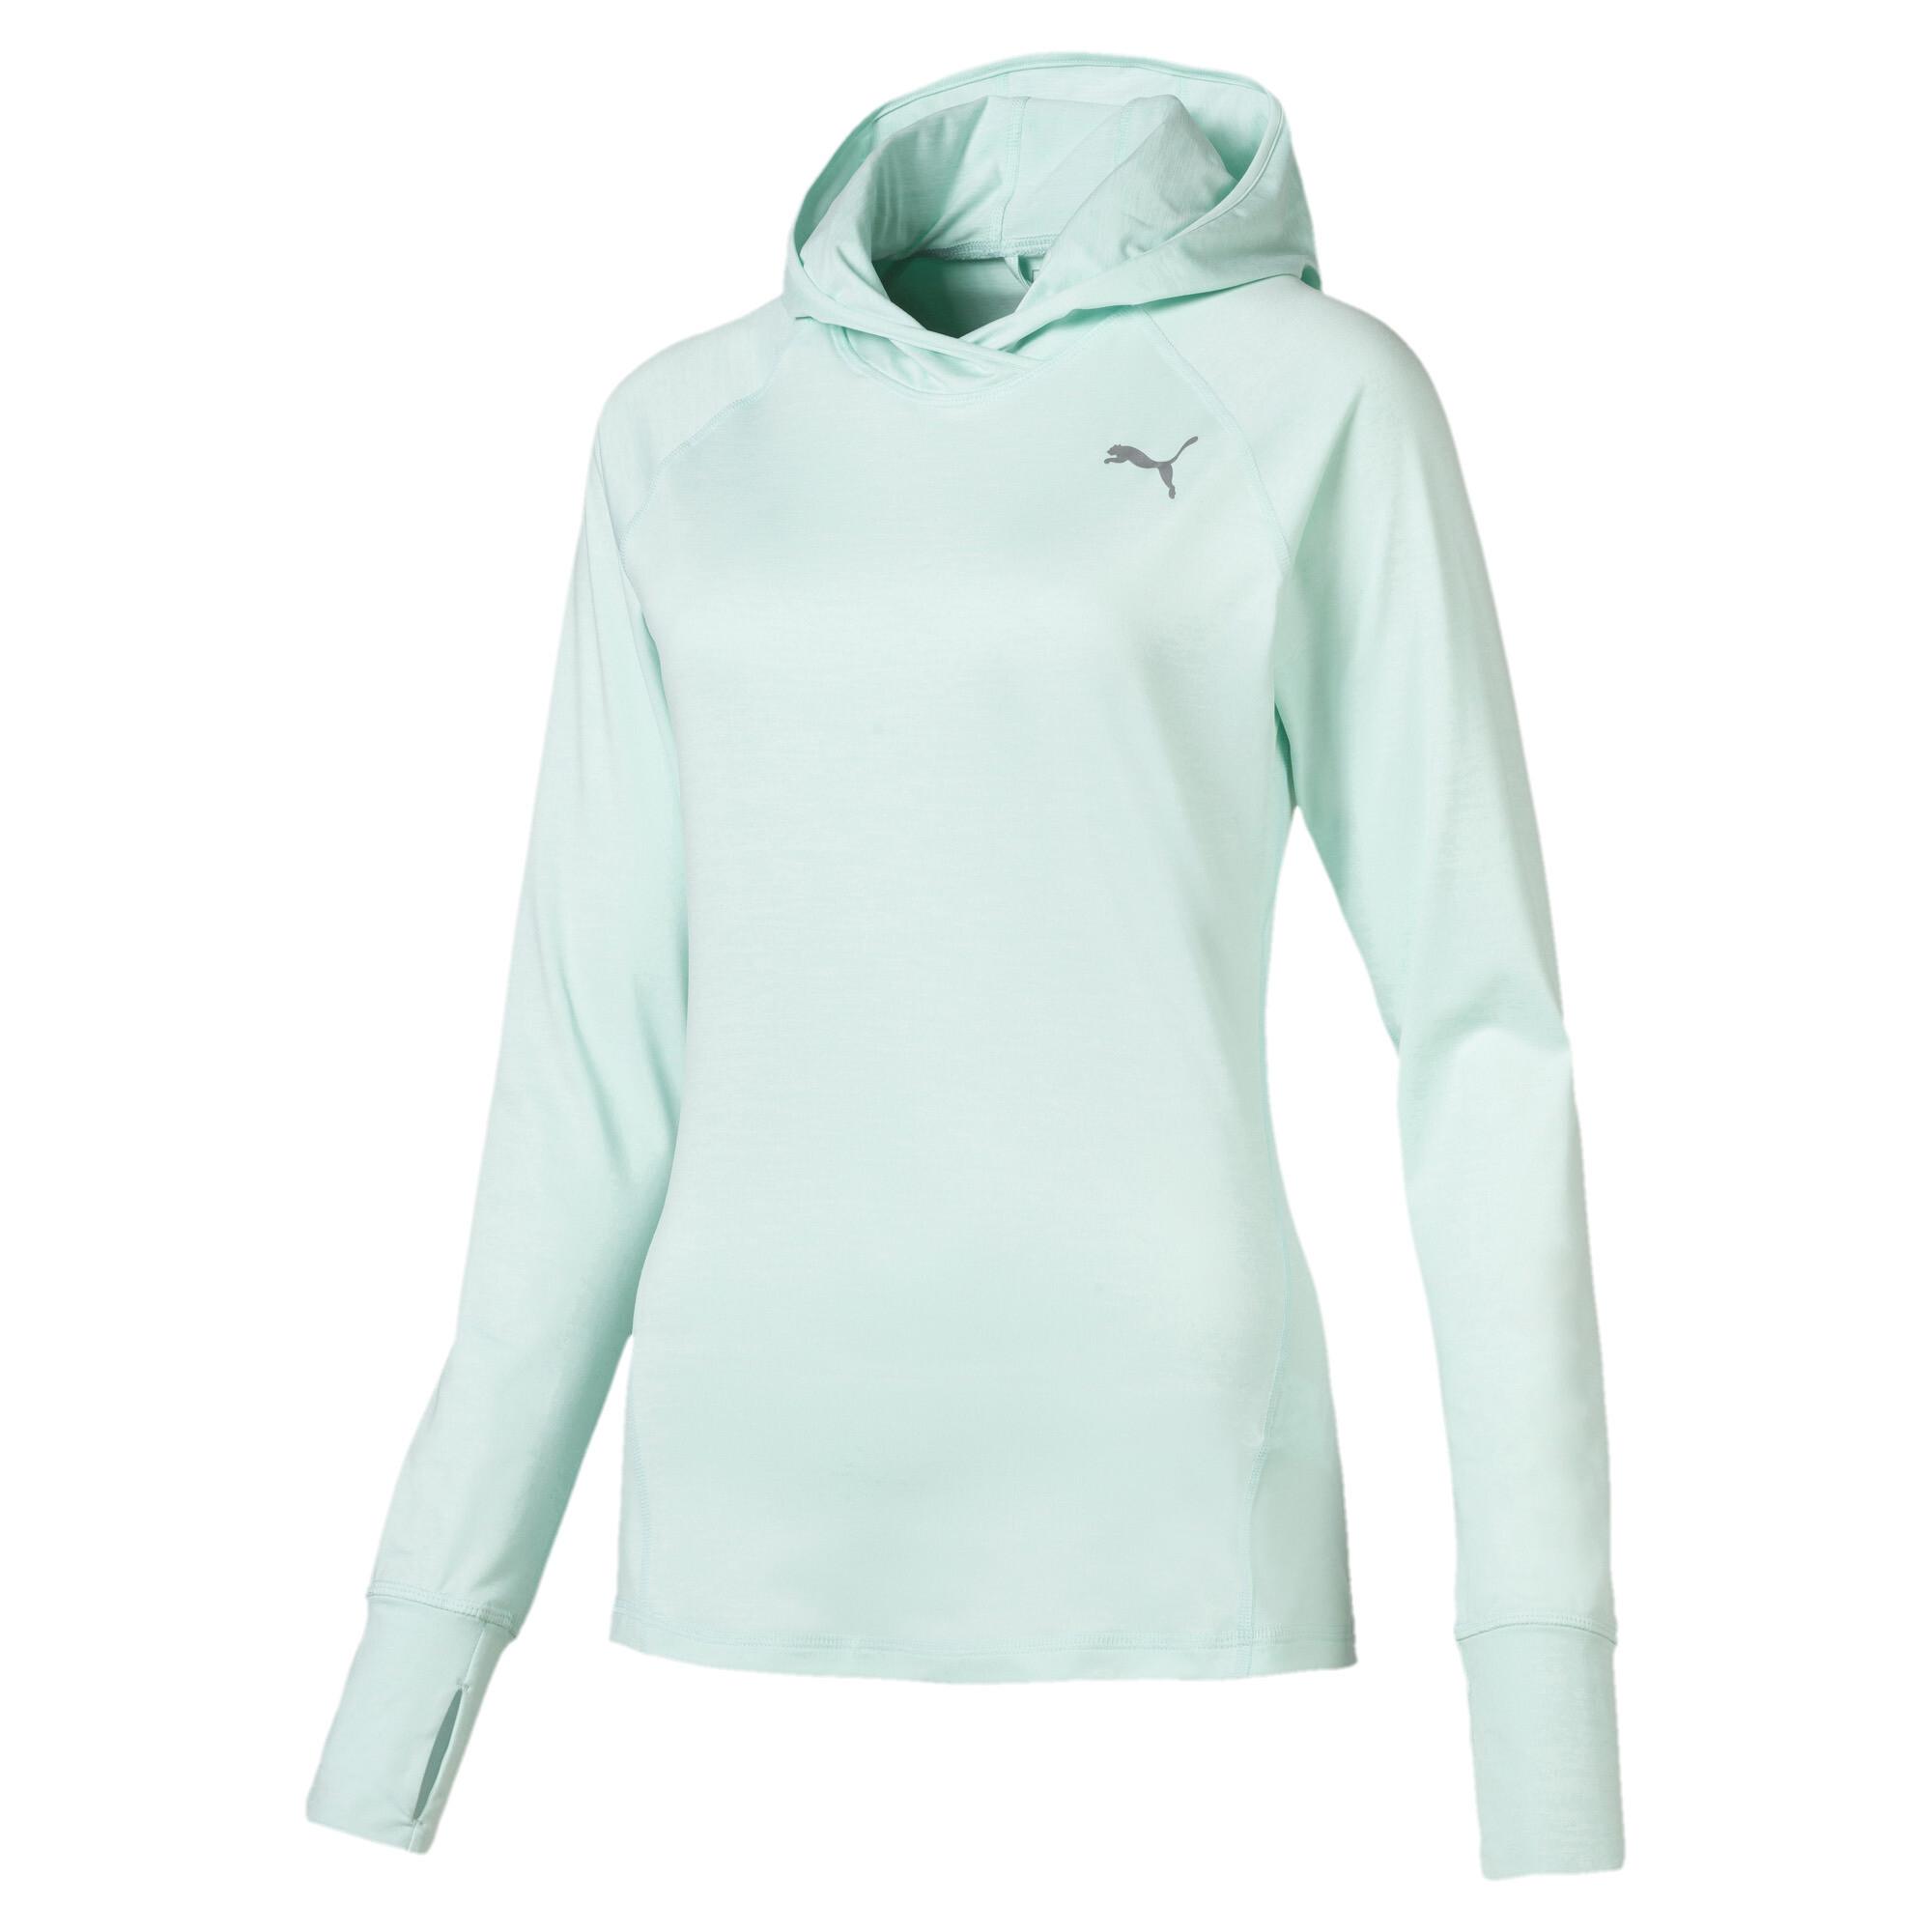 Image Puma Ignite Long Sleeve Hooded Women's Running Tee #4